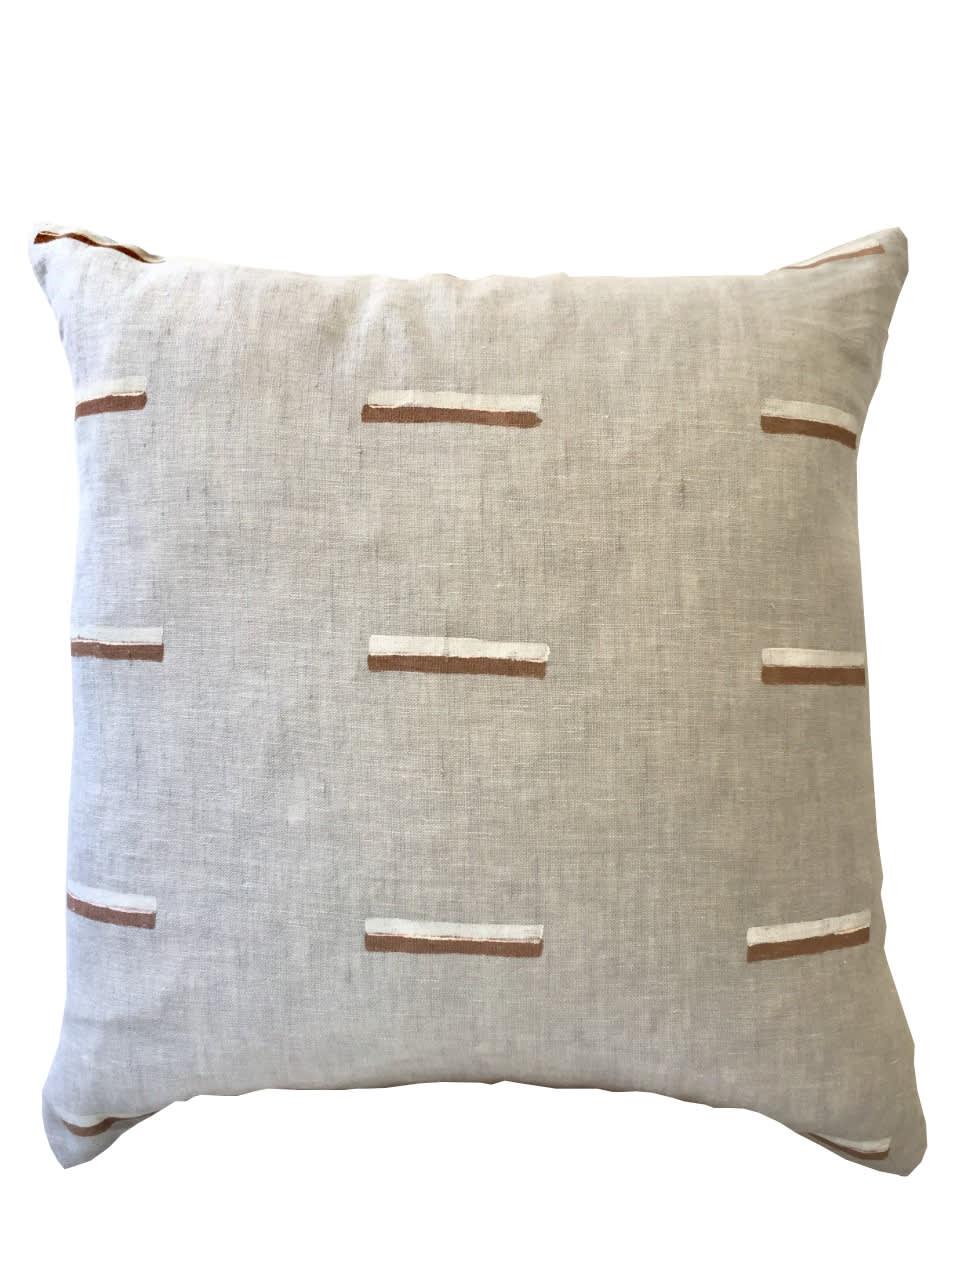 Ren London Agnes Linen Cushion in Tan